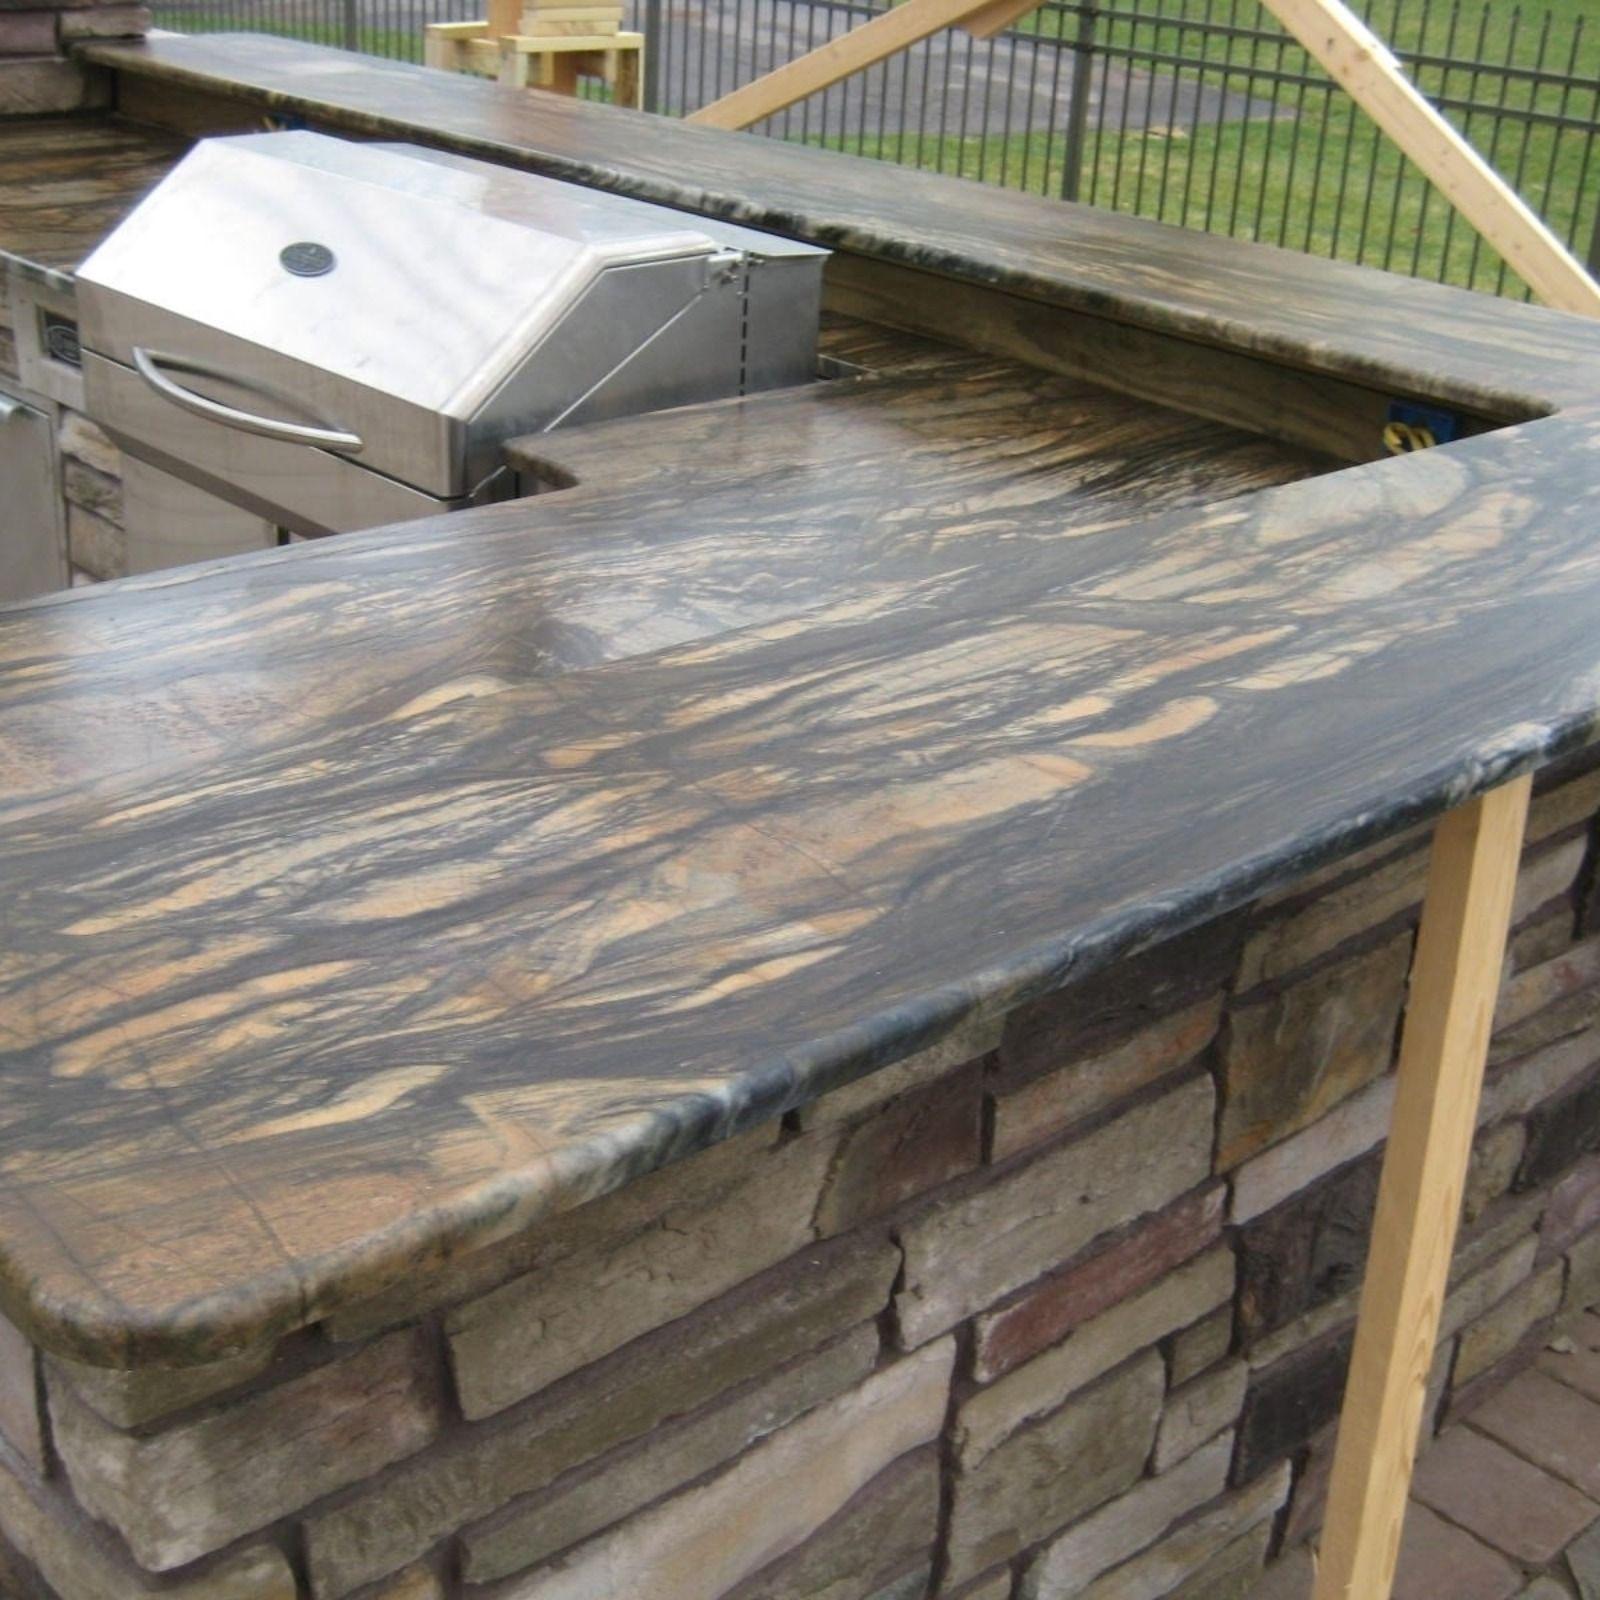 outdoor kitchen best countertop material outdoor kitchen countertops outdoor kitchen design on outdoor kitchen quartzite id=90457